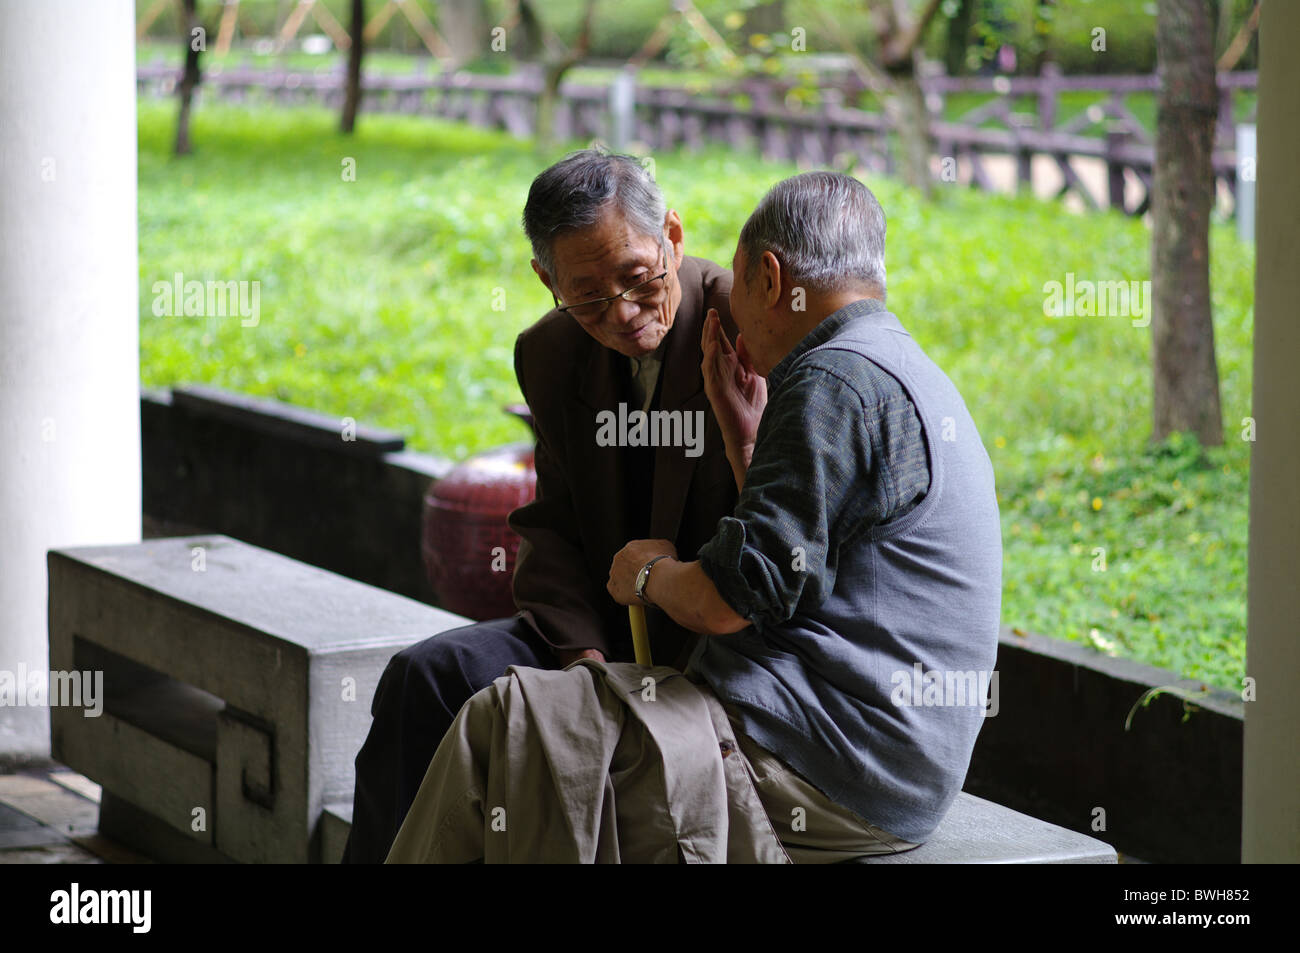 Two old men chatting, Taipei, Taiwan Stock Photo